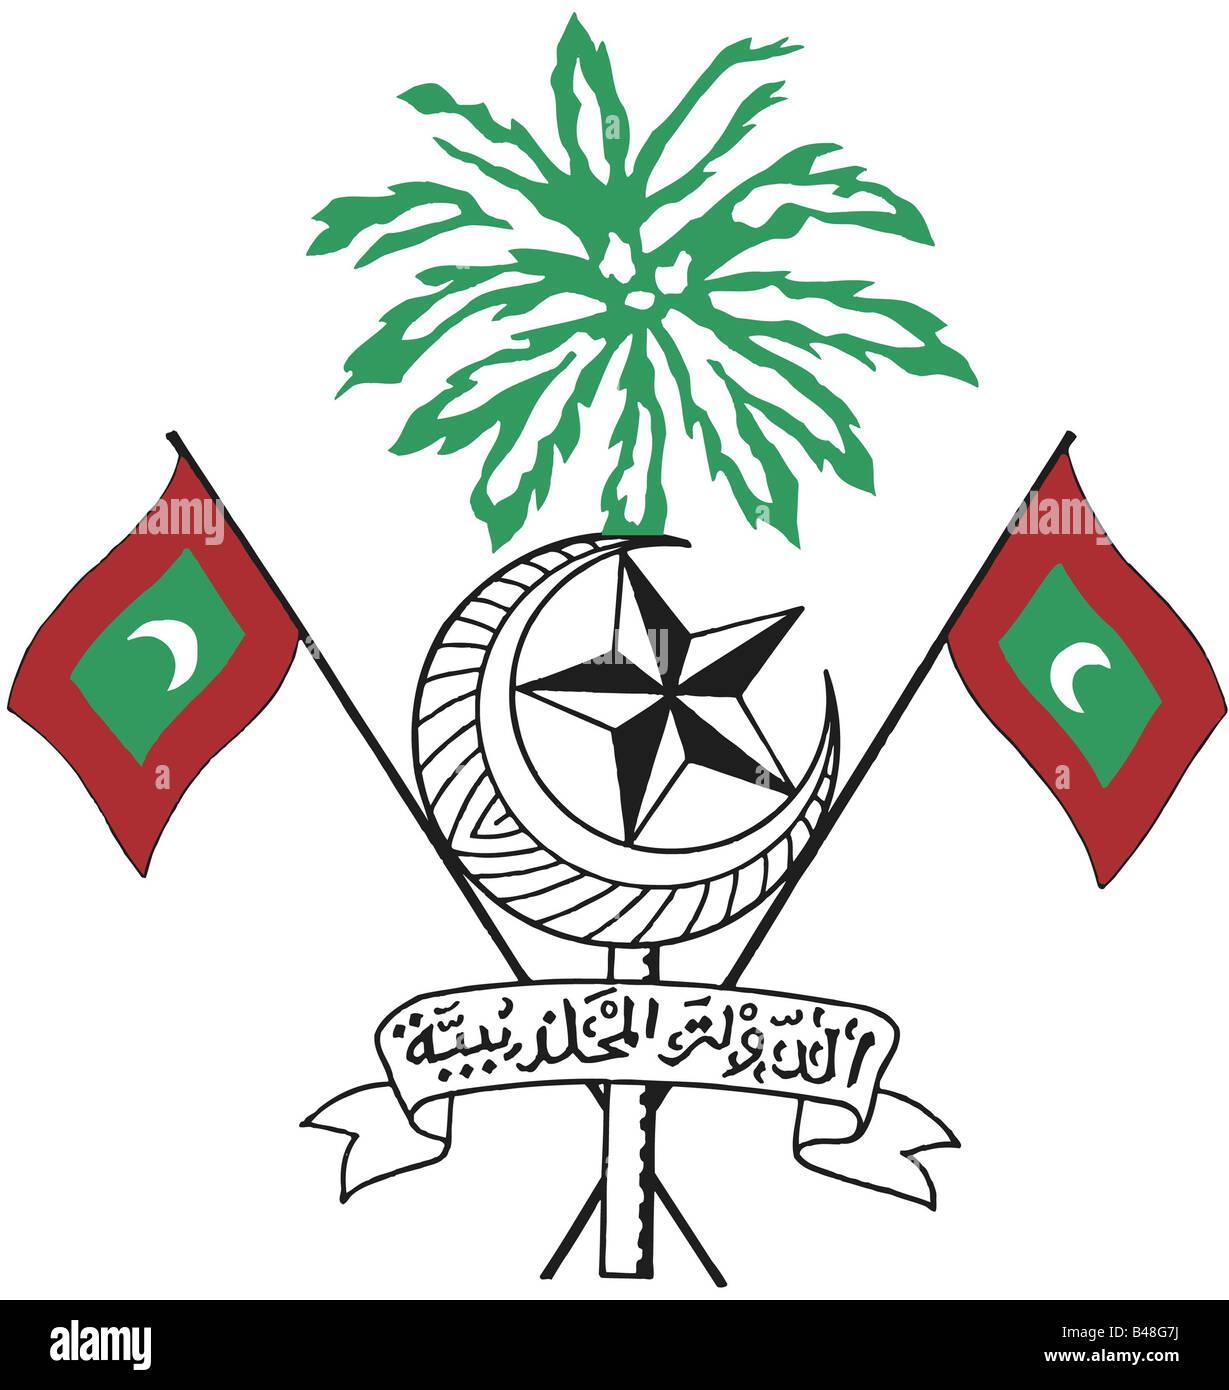 Heraldry emblem maledives national coat of arms introduced heraldry emblem maledives national coat of arms introduced 1965 asia symbol flags half moon star islam palm geograp biocorpaavc